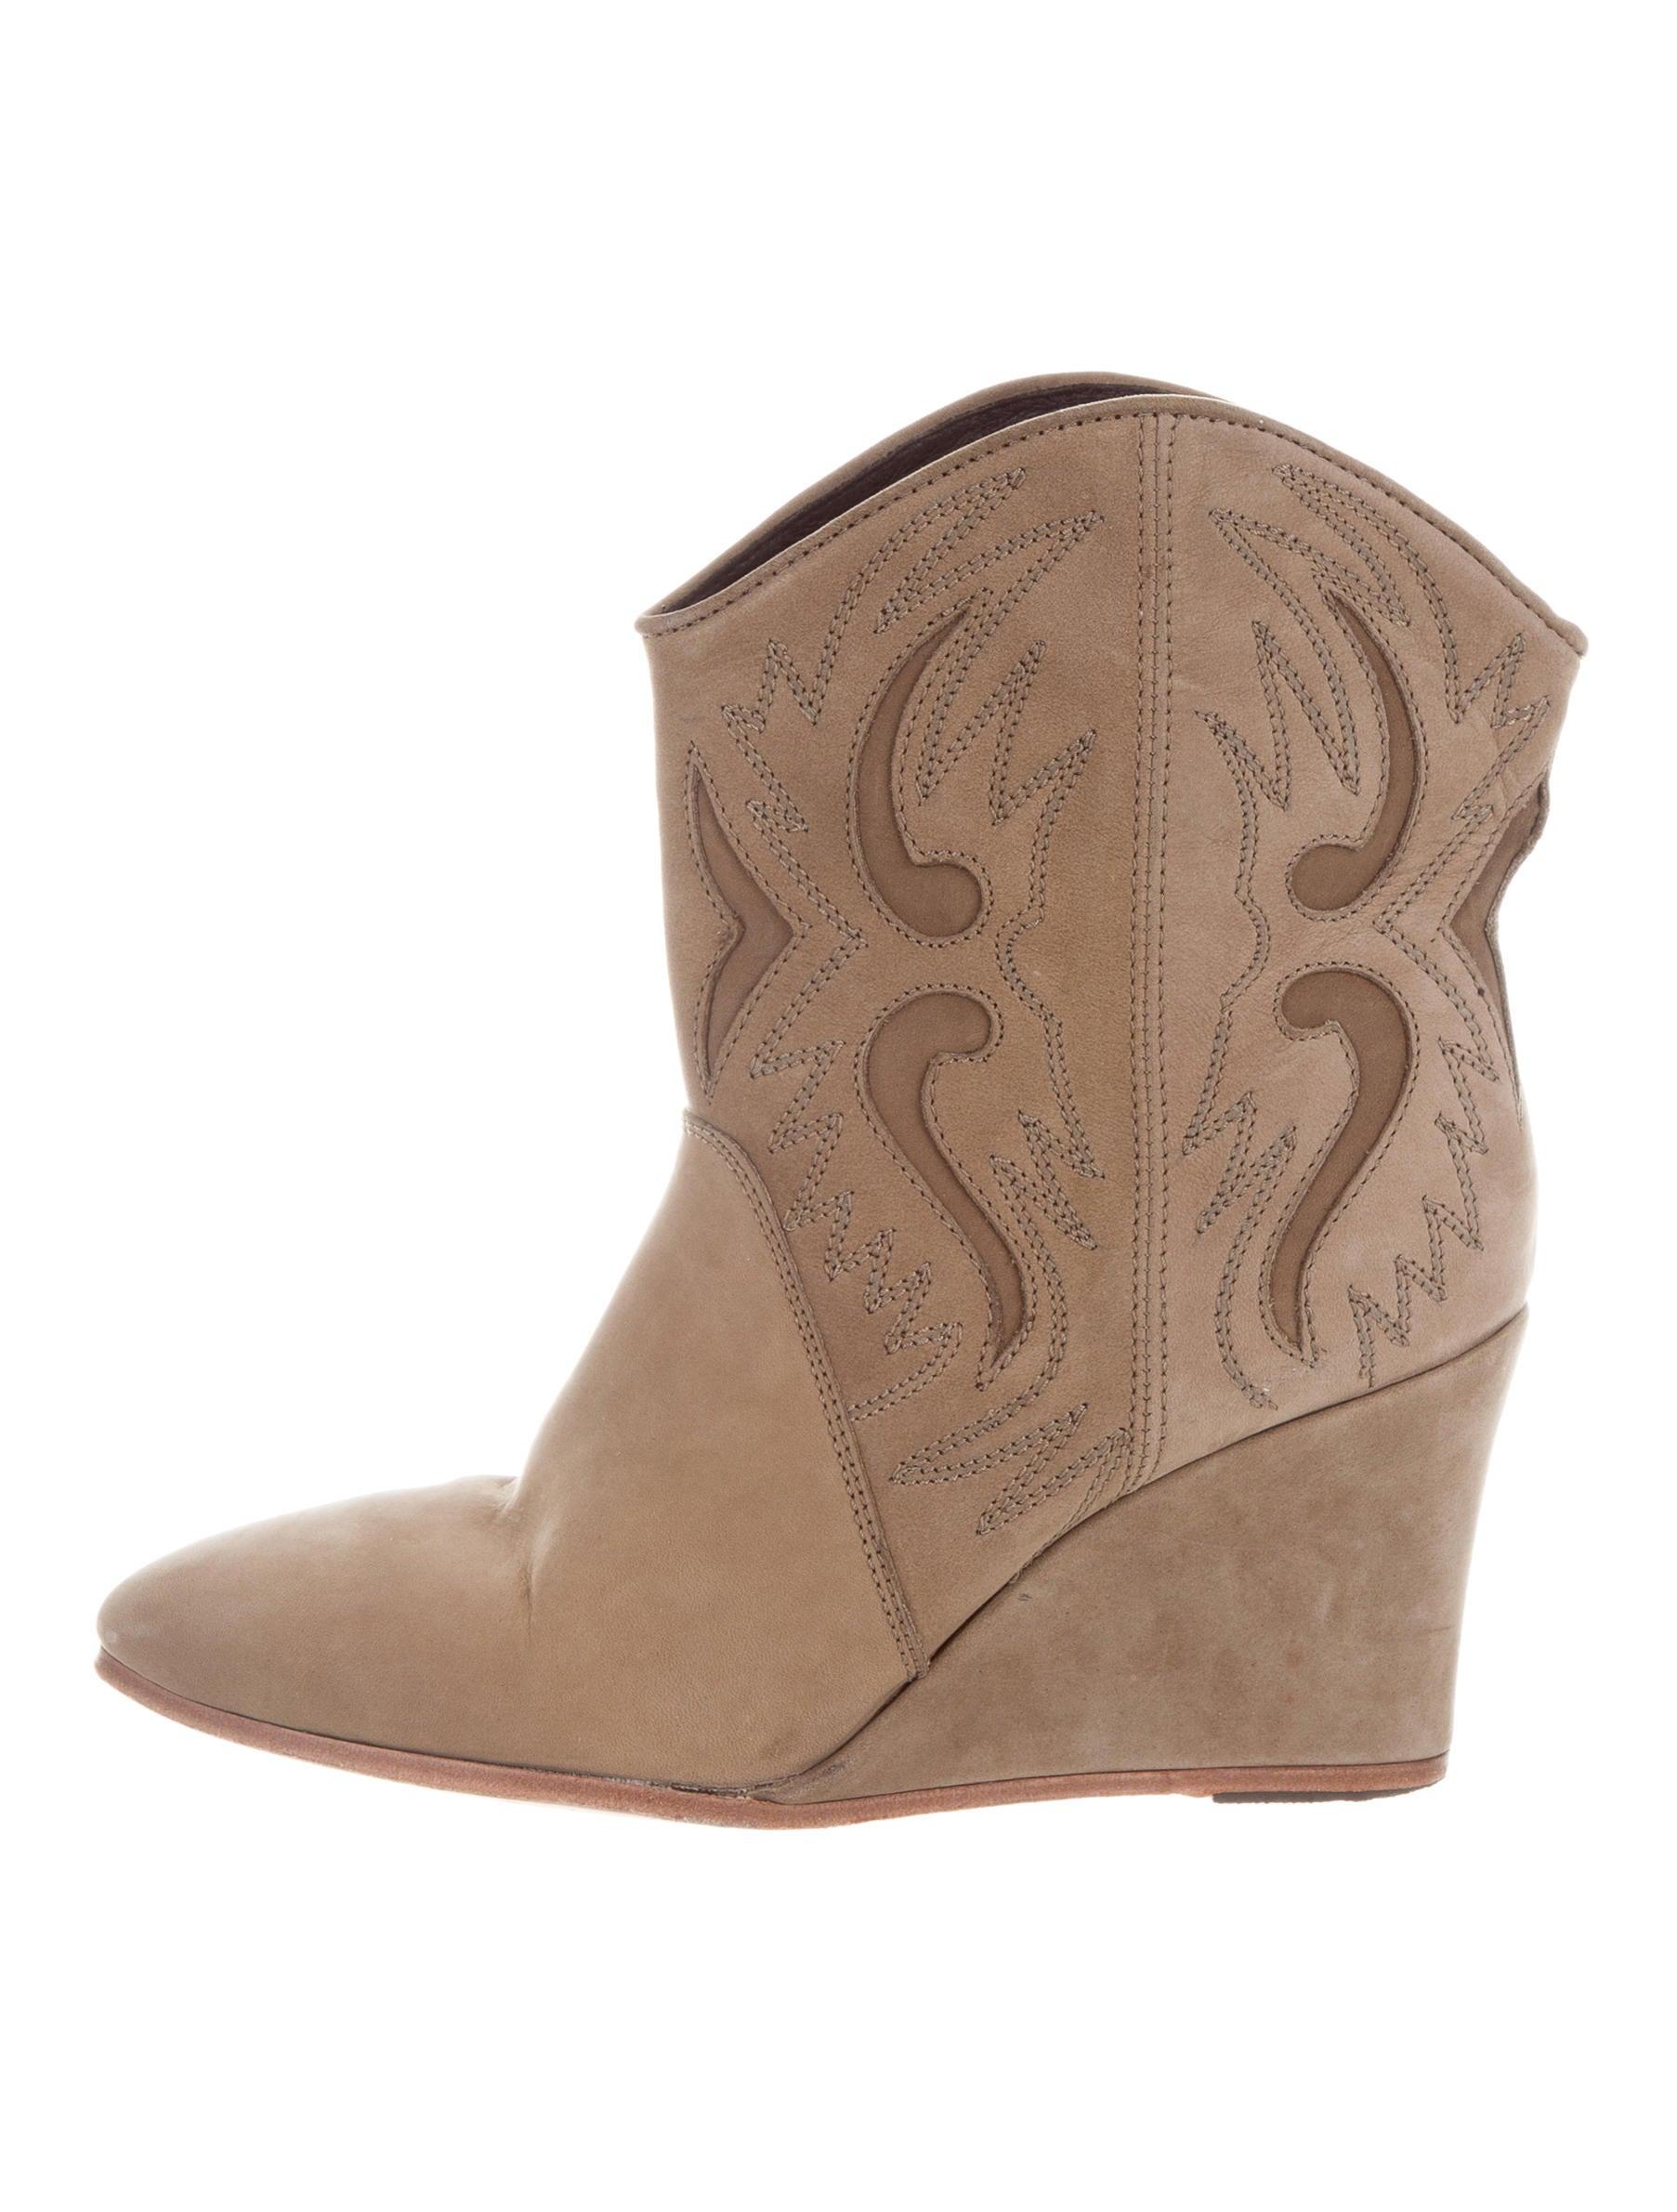 good selling cheap price Comptoir Des Cotonniers Laser Cut Wedge Ankle Boots buy cheap authentic outlet great deals 4LfRqcmj